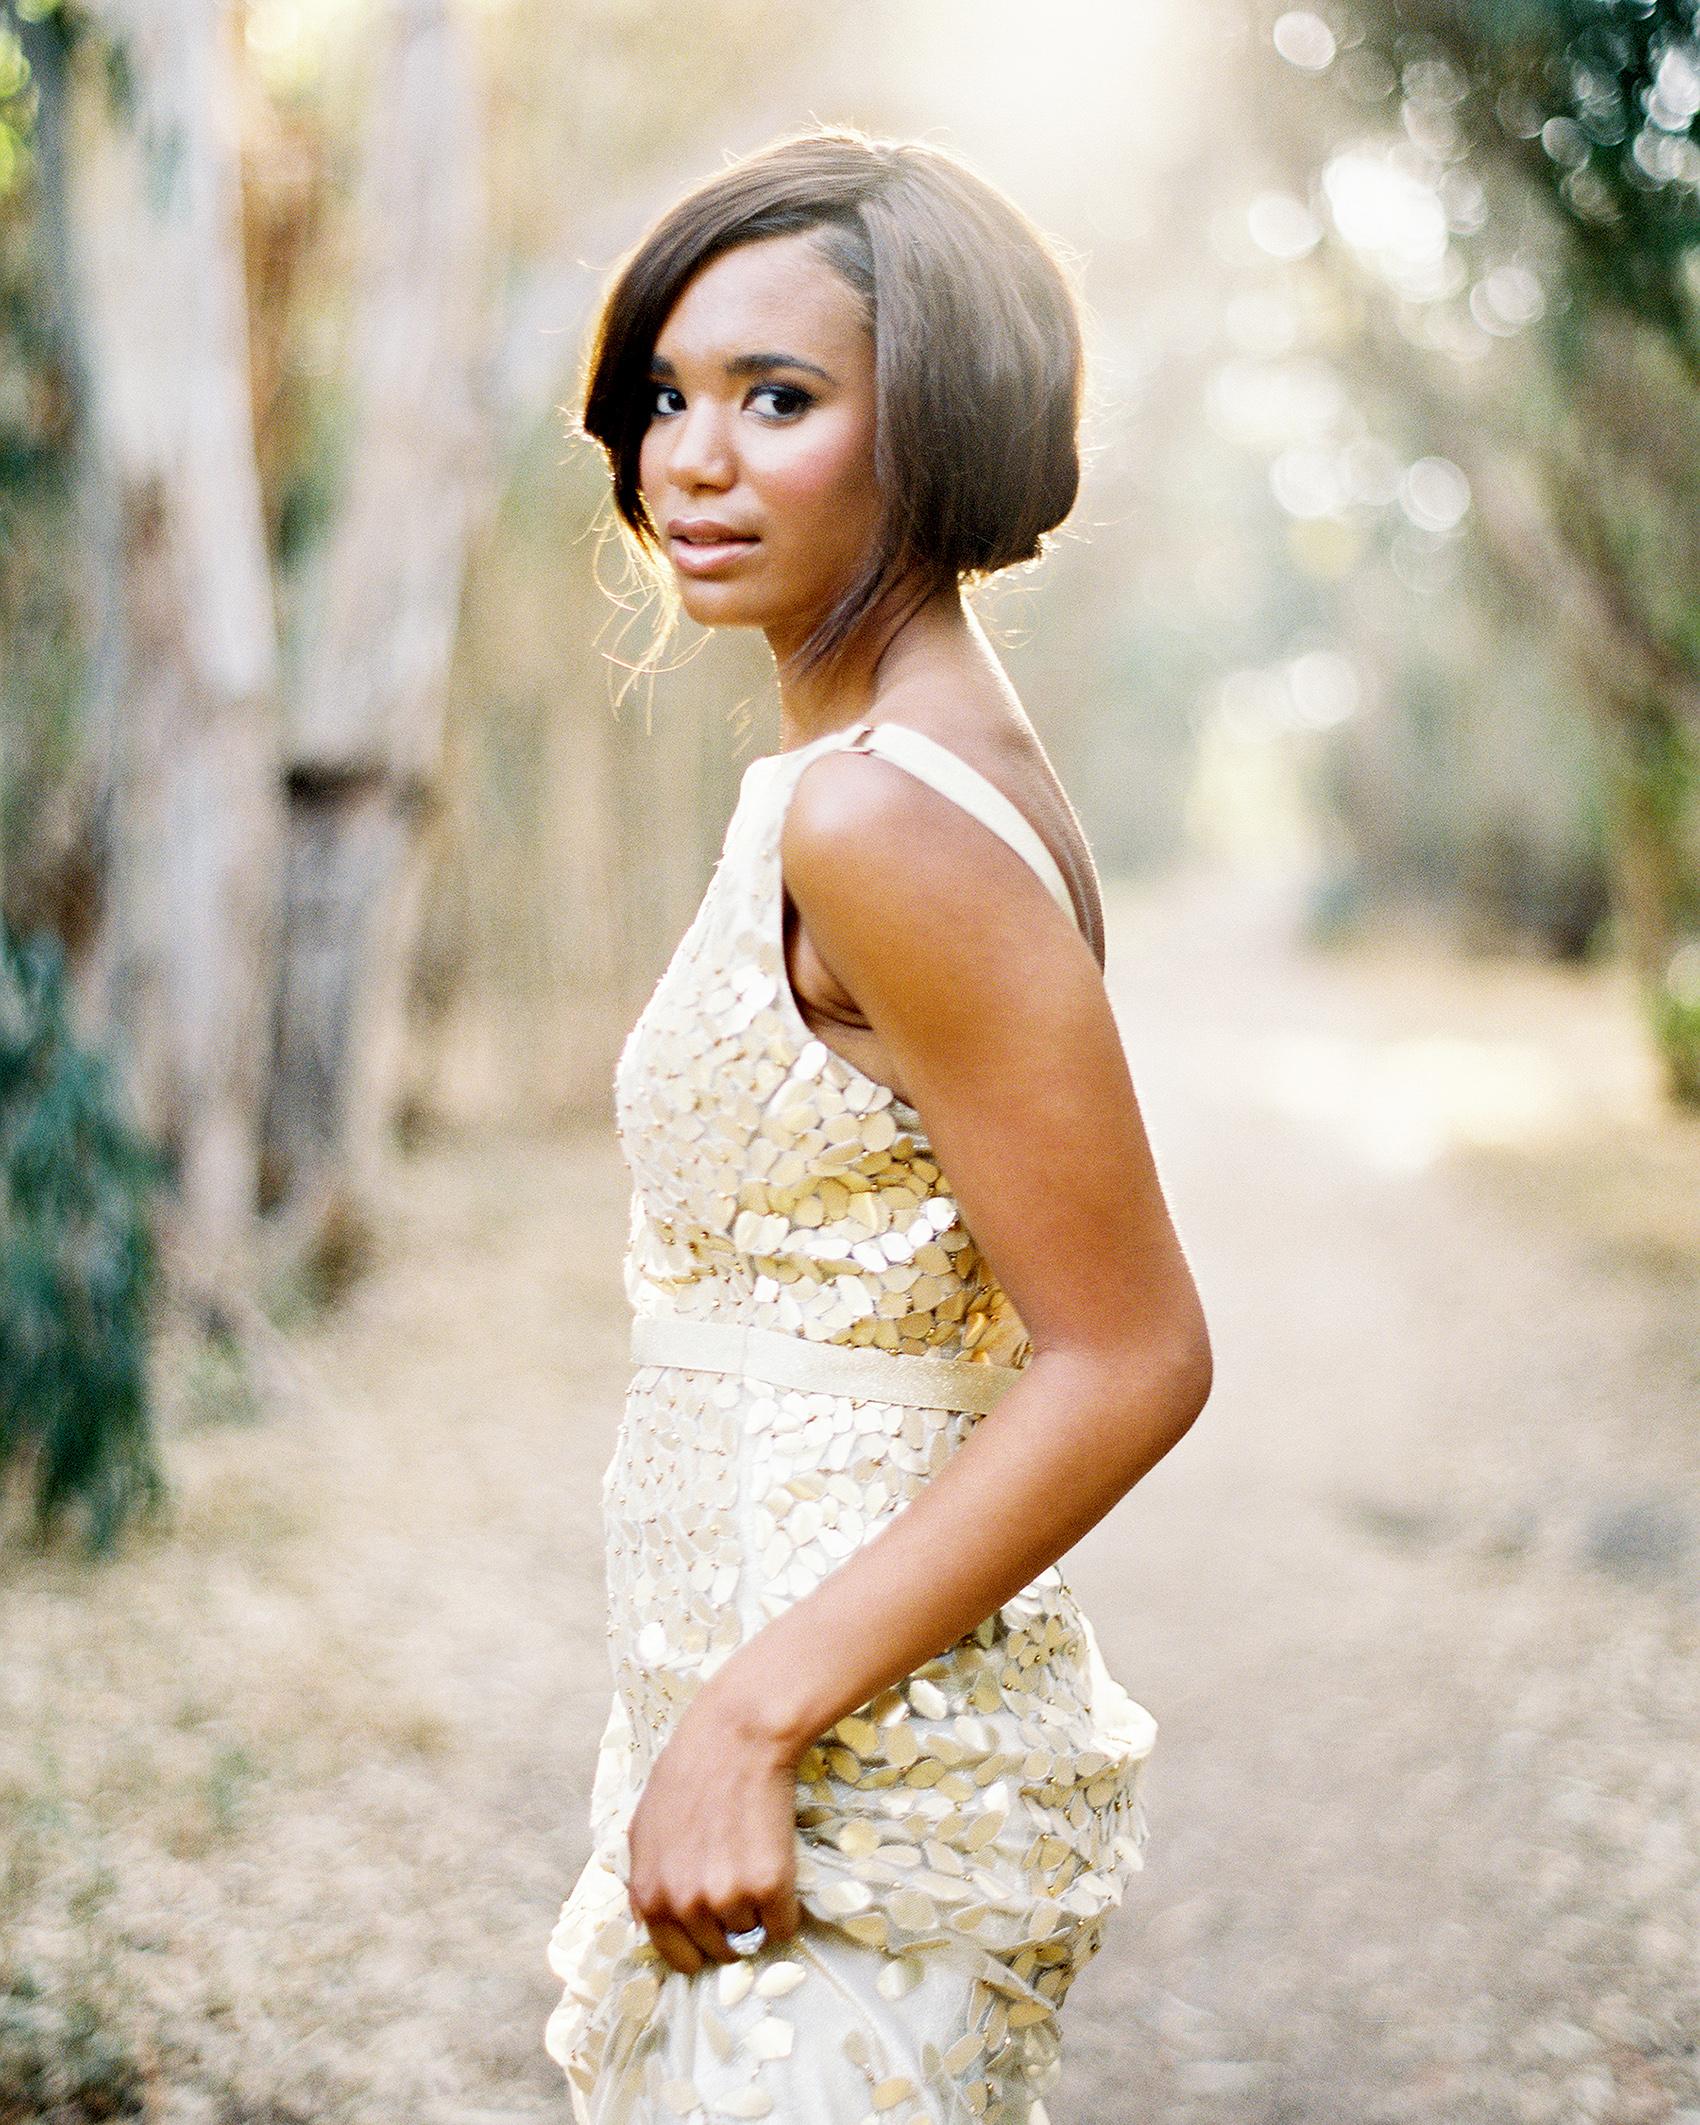 metallic gold wedding dress on bride